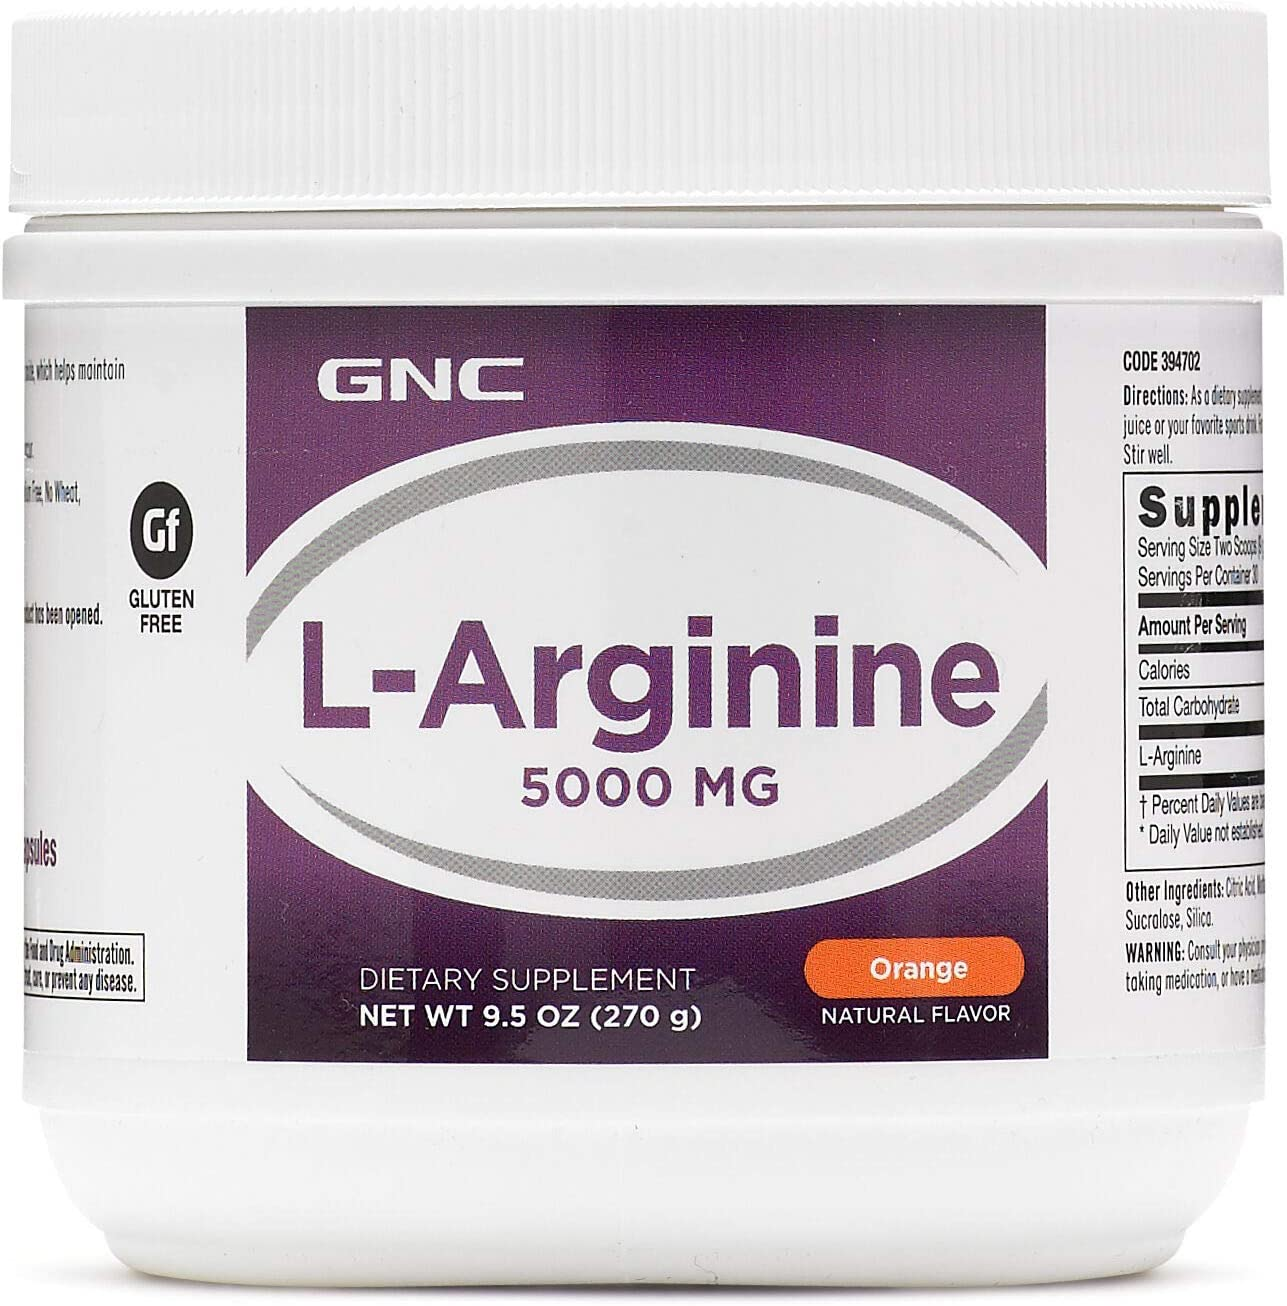 GNC LArginine 5000mg Orange 270 g